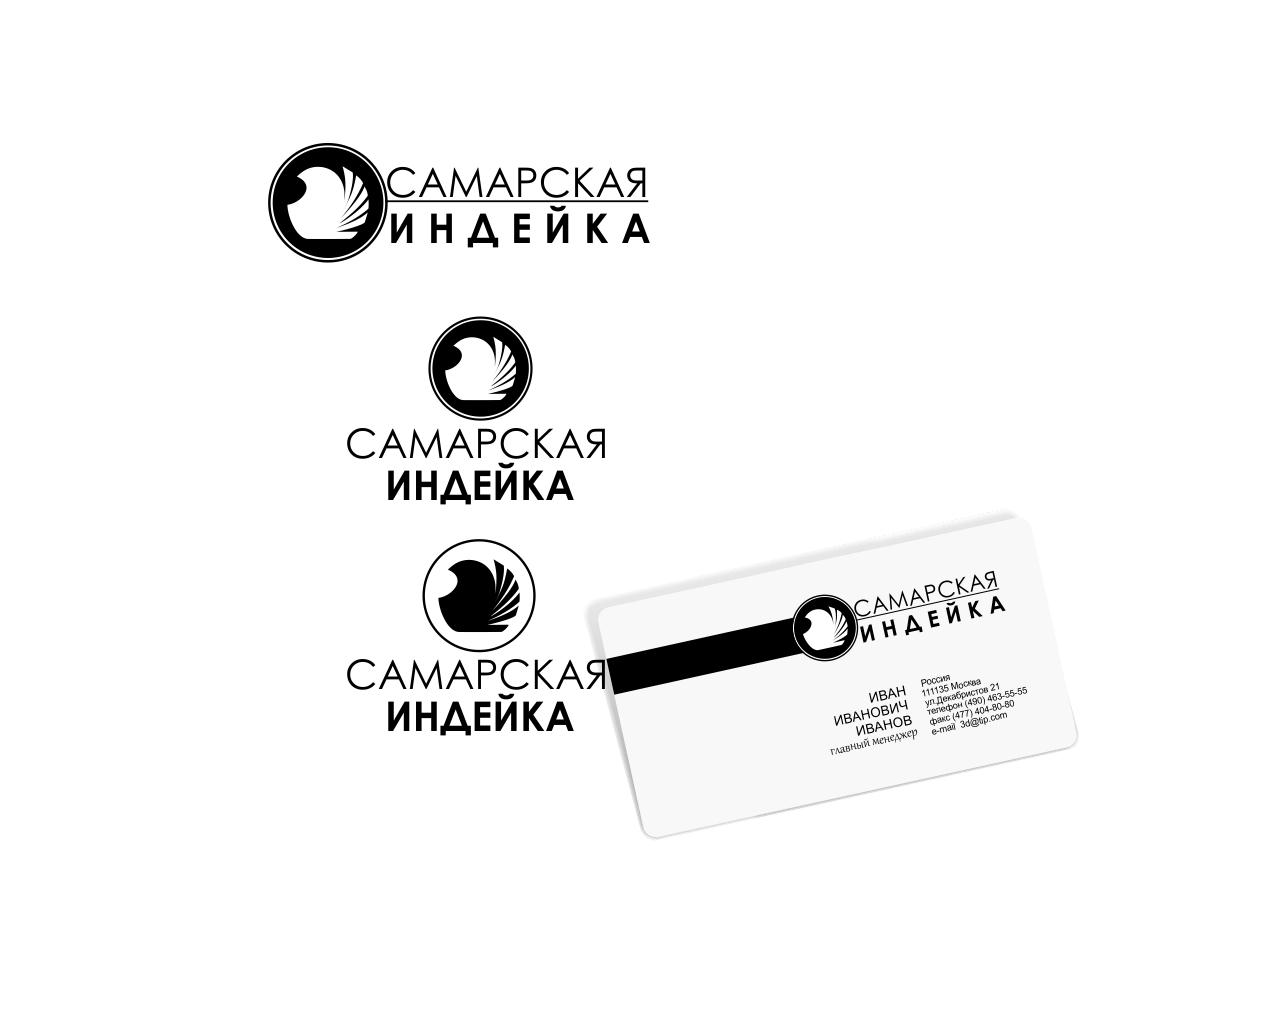 Создание логотипа Сельхоз производителя фото f_13155e8496d08571.jpg